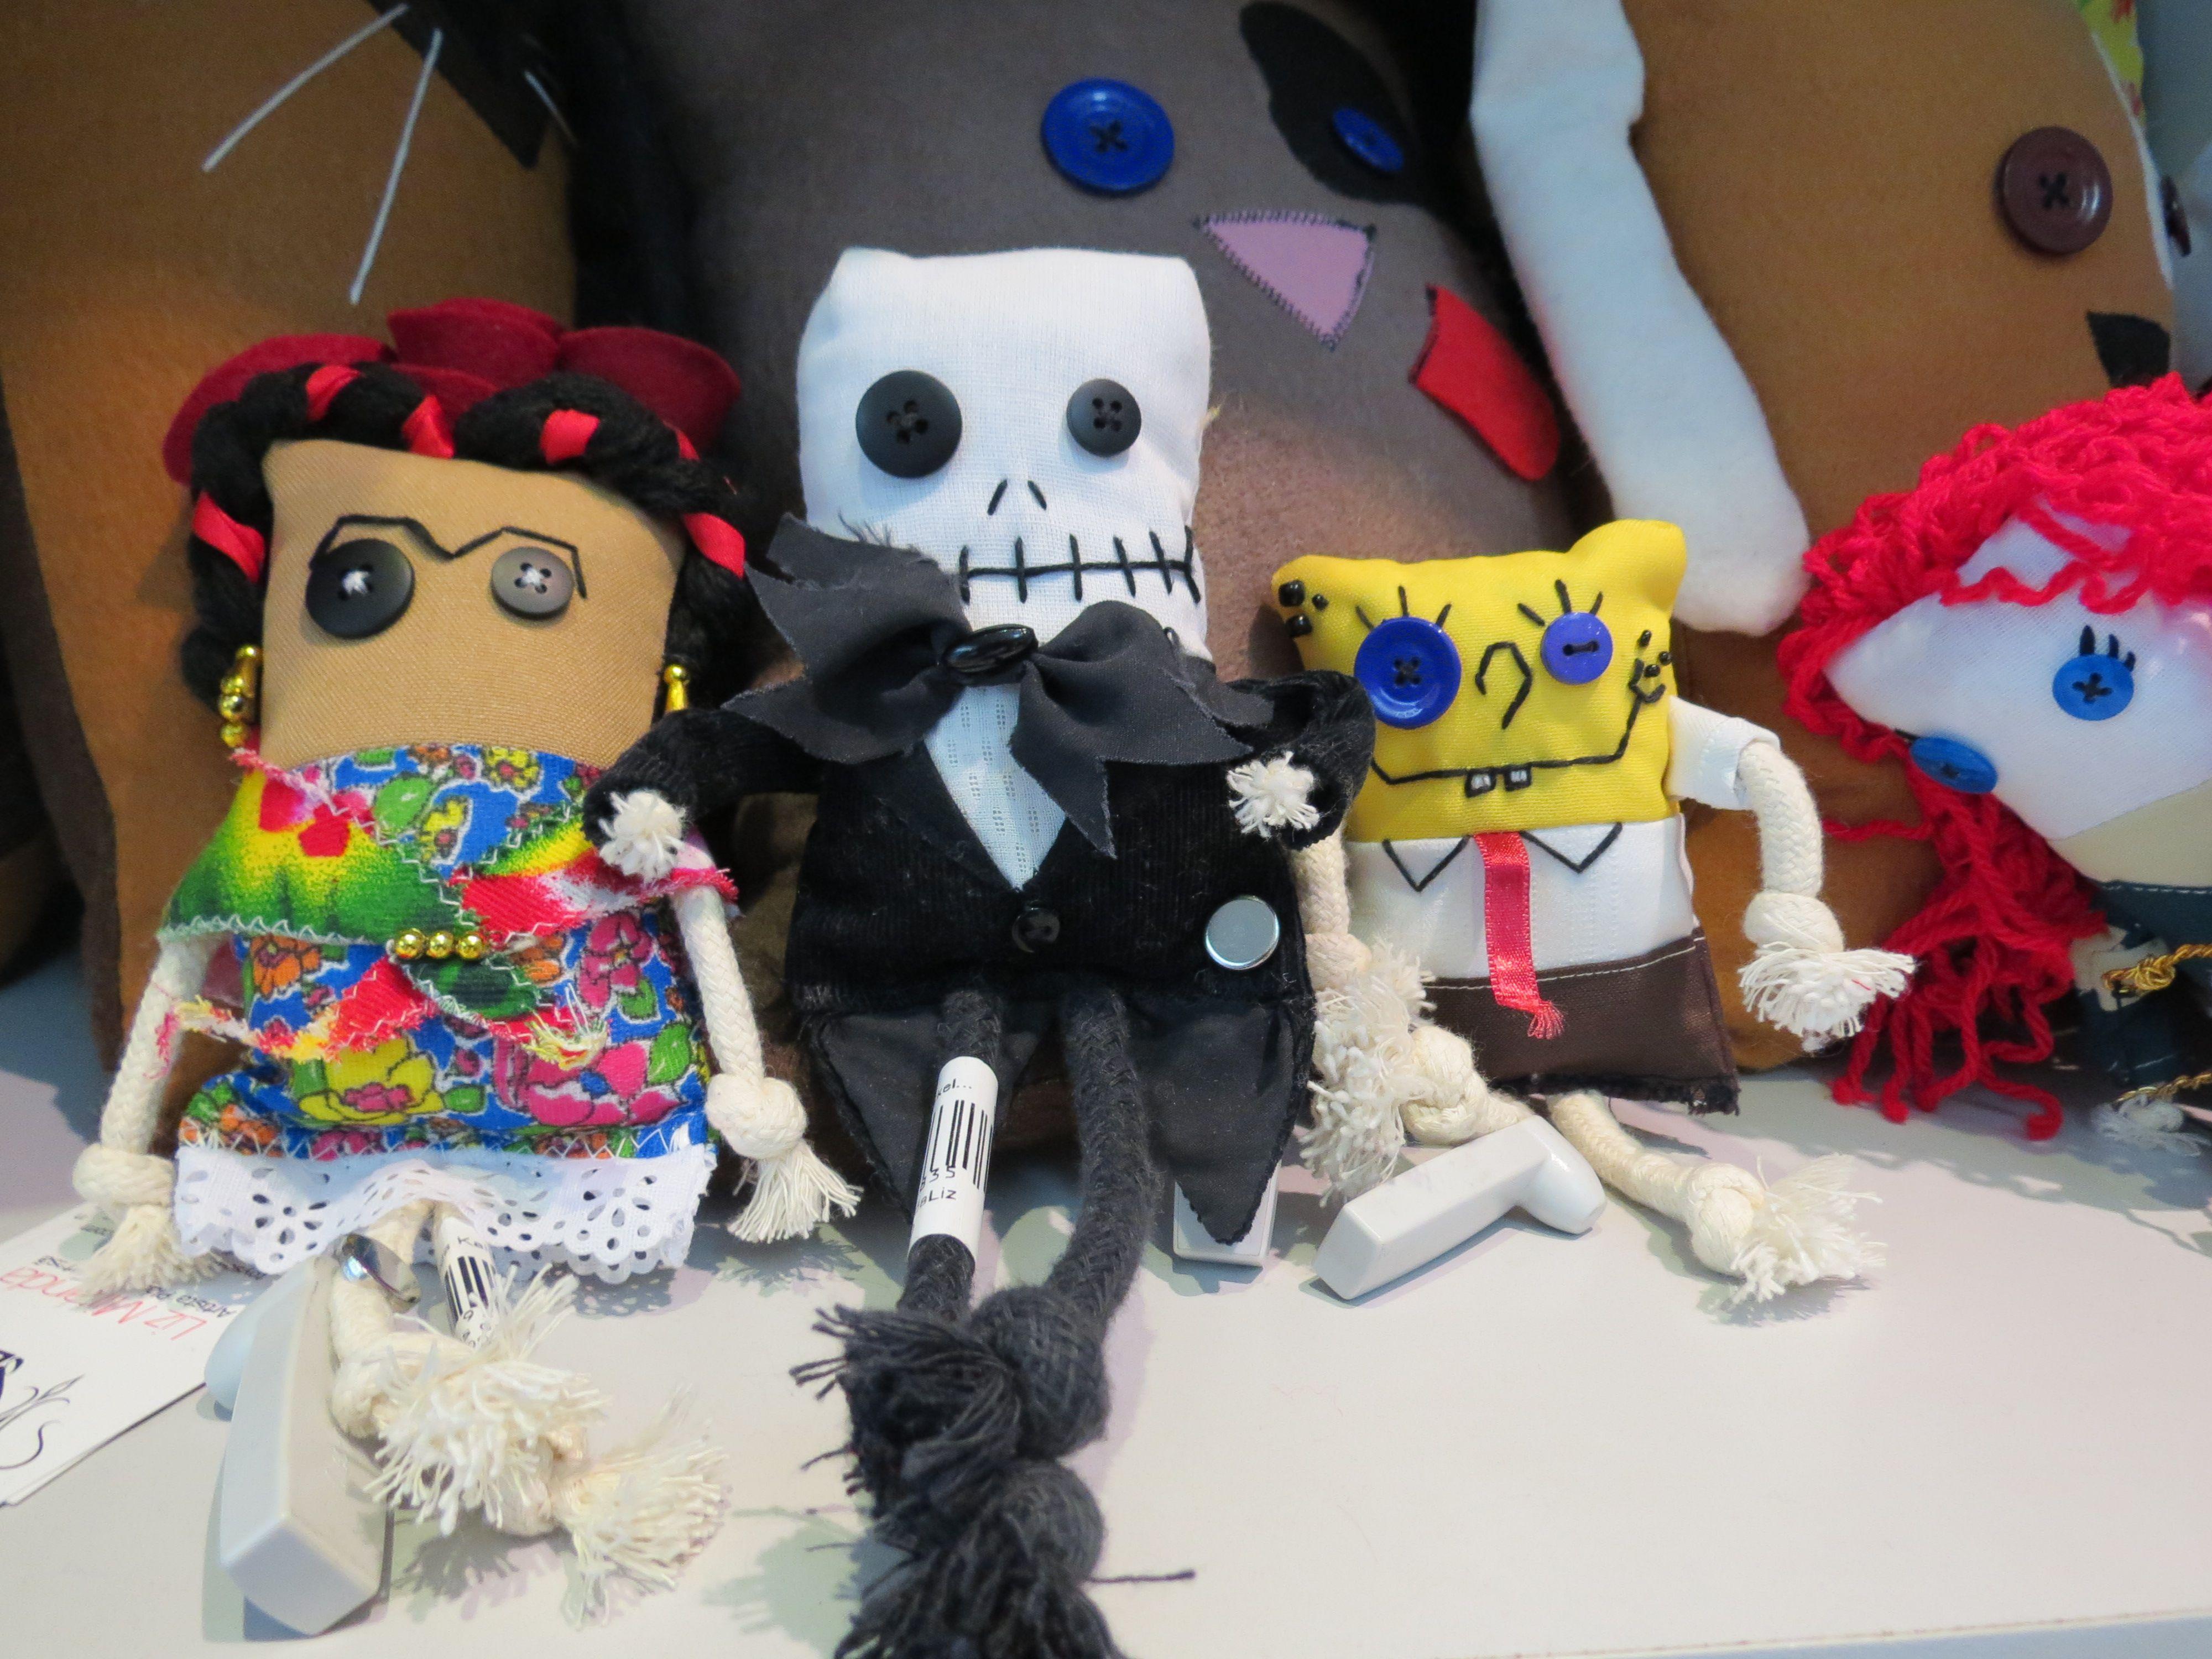 #endossa, #augusta, #presente, #gift, #boneco, #bonecodepano, #frida, #fridakahlo, #jack, #bobesponja, #spongebob